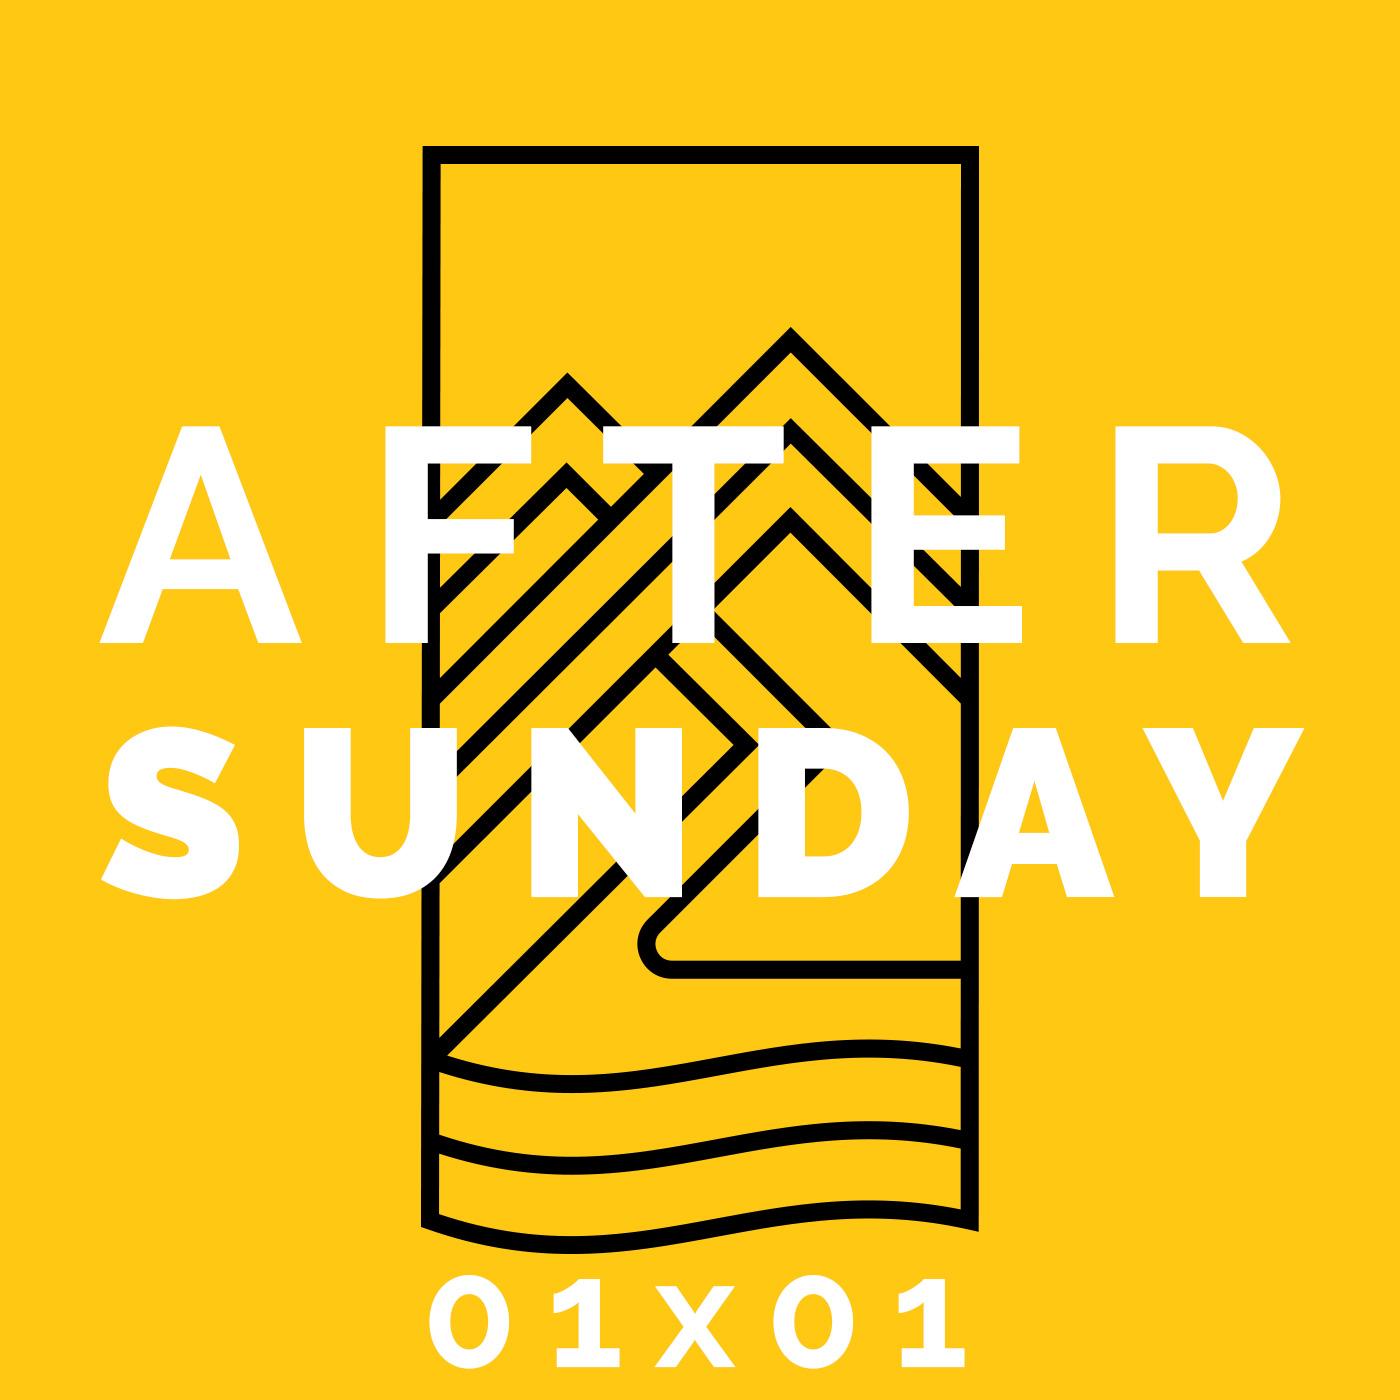 After-Sunday-01x01.jpg